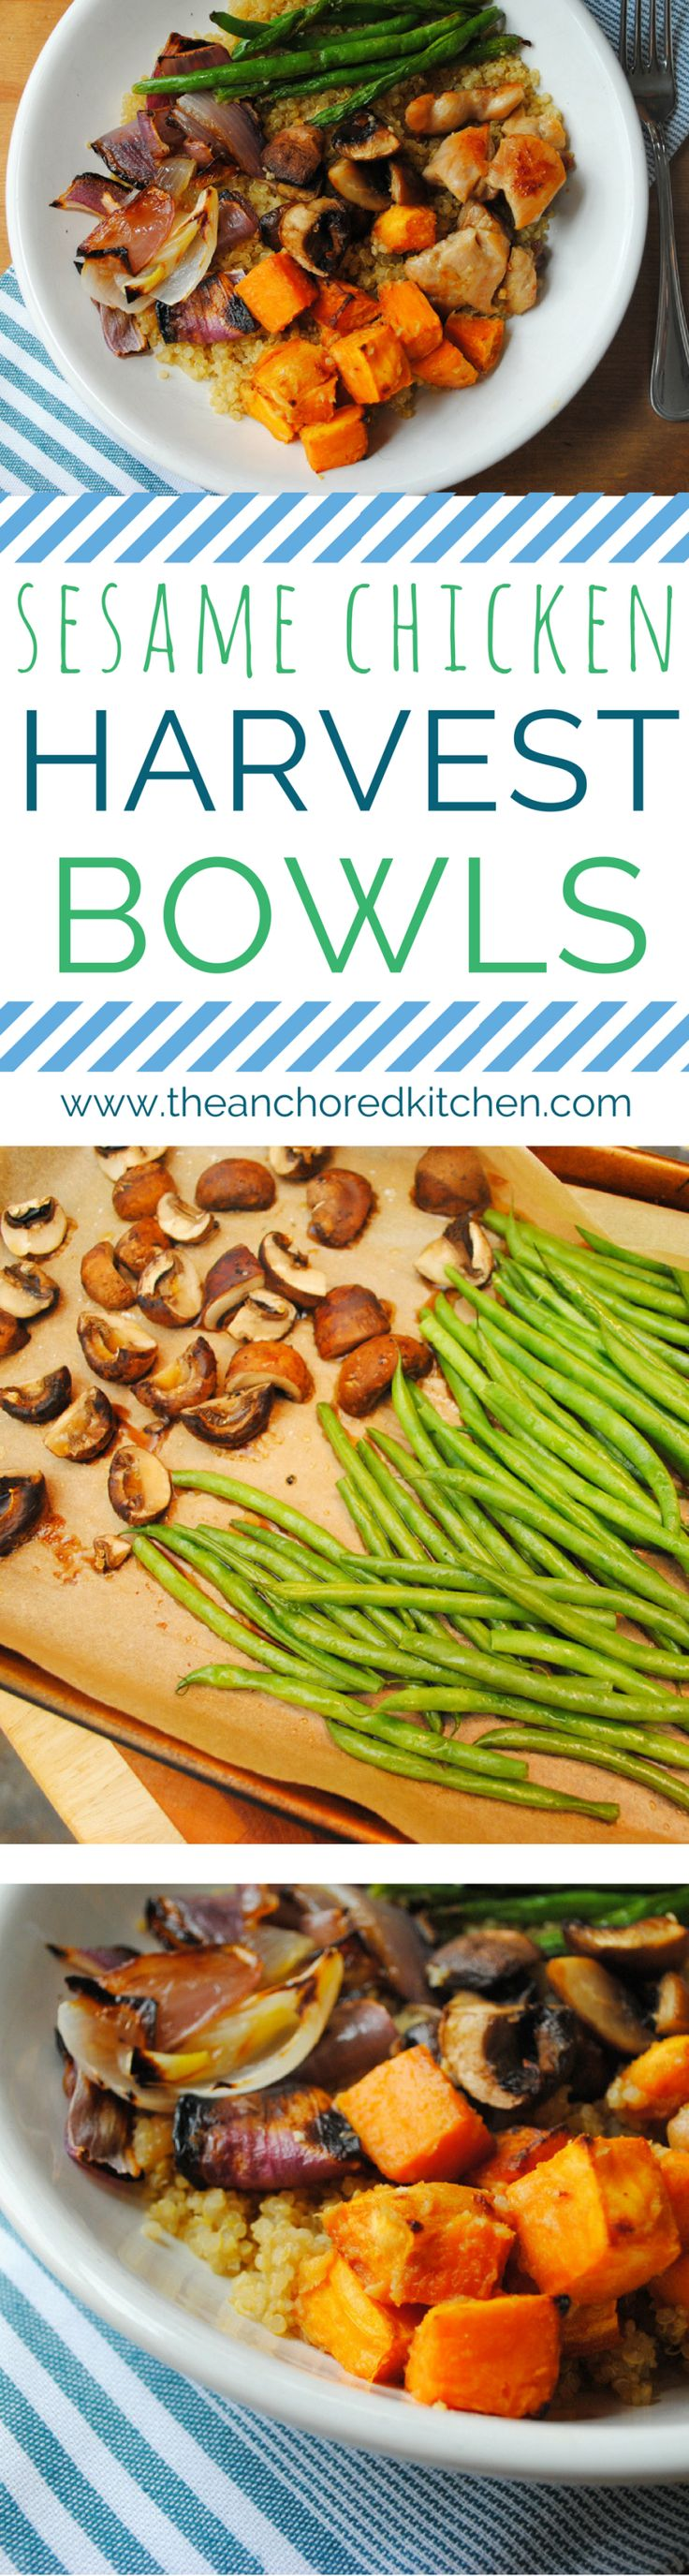 Sesame Chicken Harvest Bowls - The Anchored Kitchen #sheetpan #sesame #chickendinners #easydinners #asianflavors